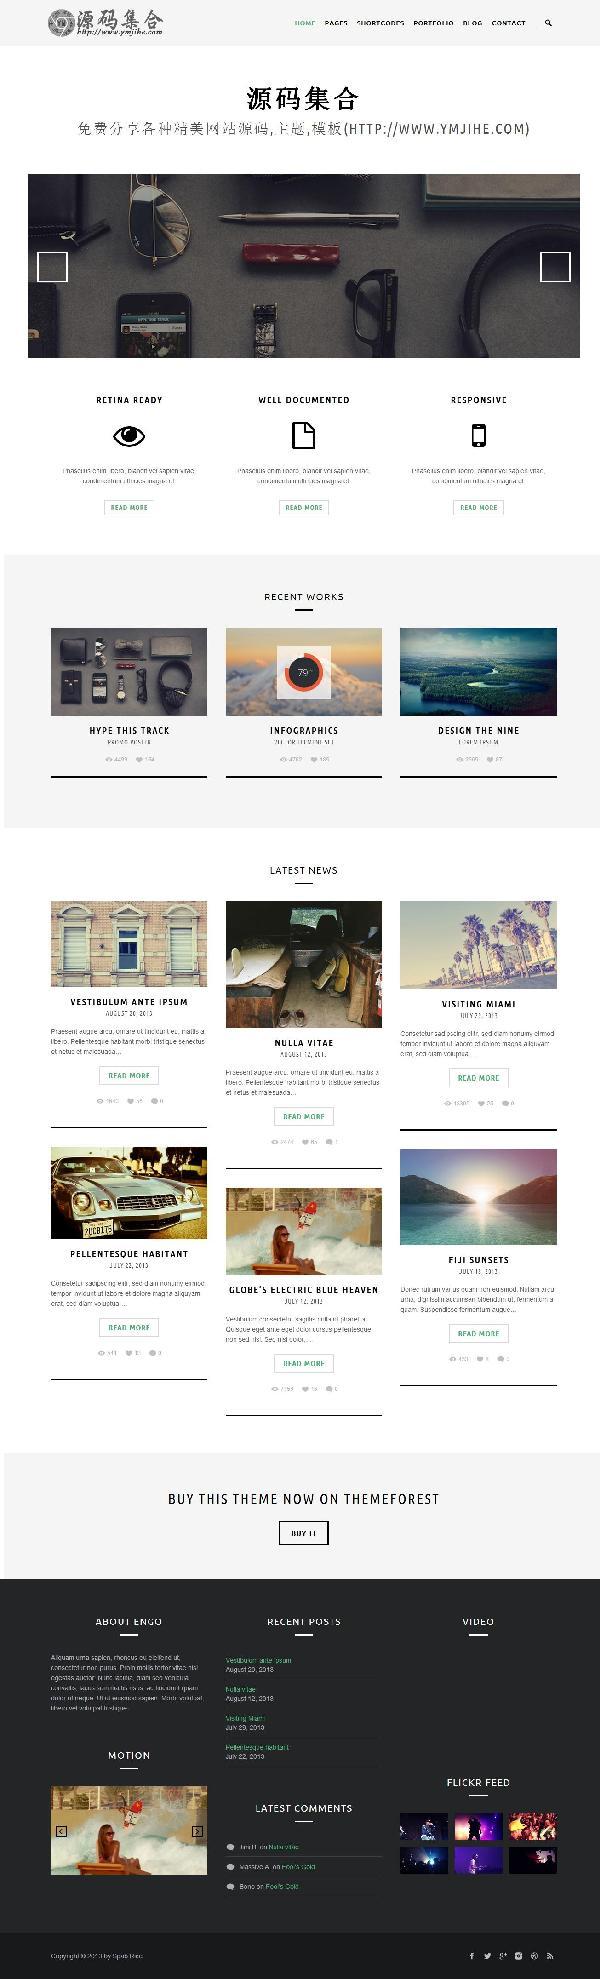 WordPress企业案例展示Engo 1.3响应式主题分享